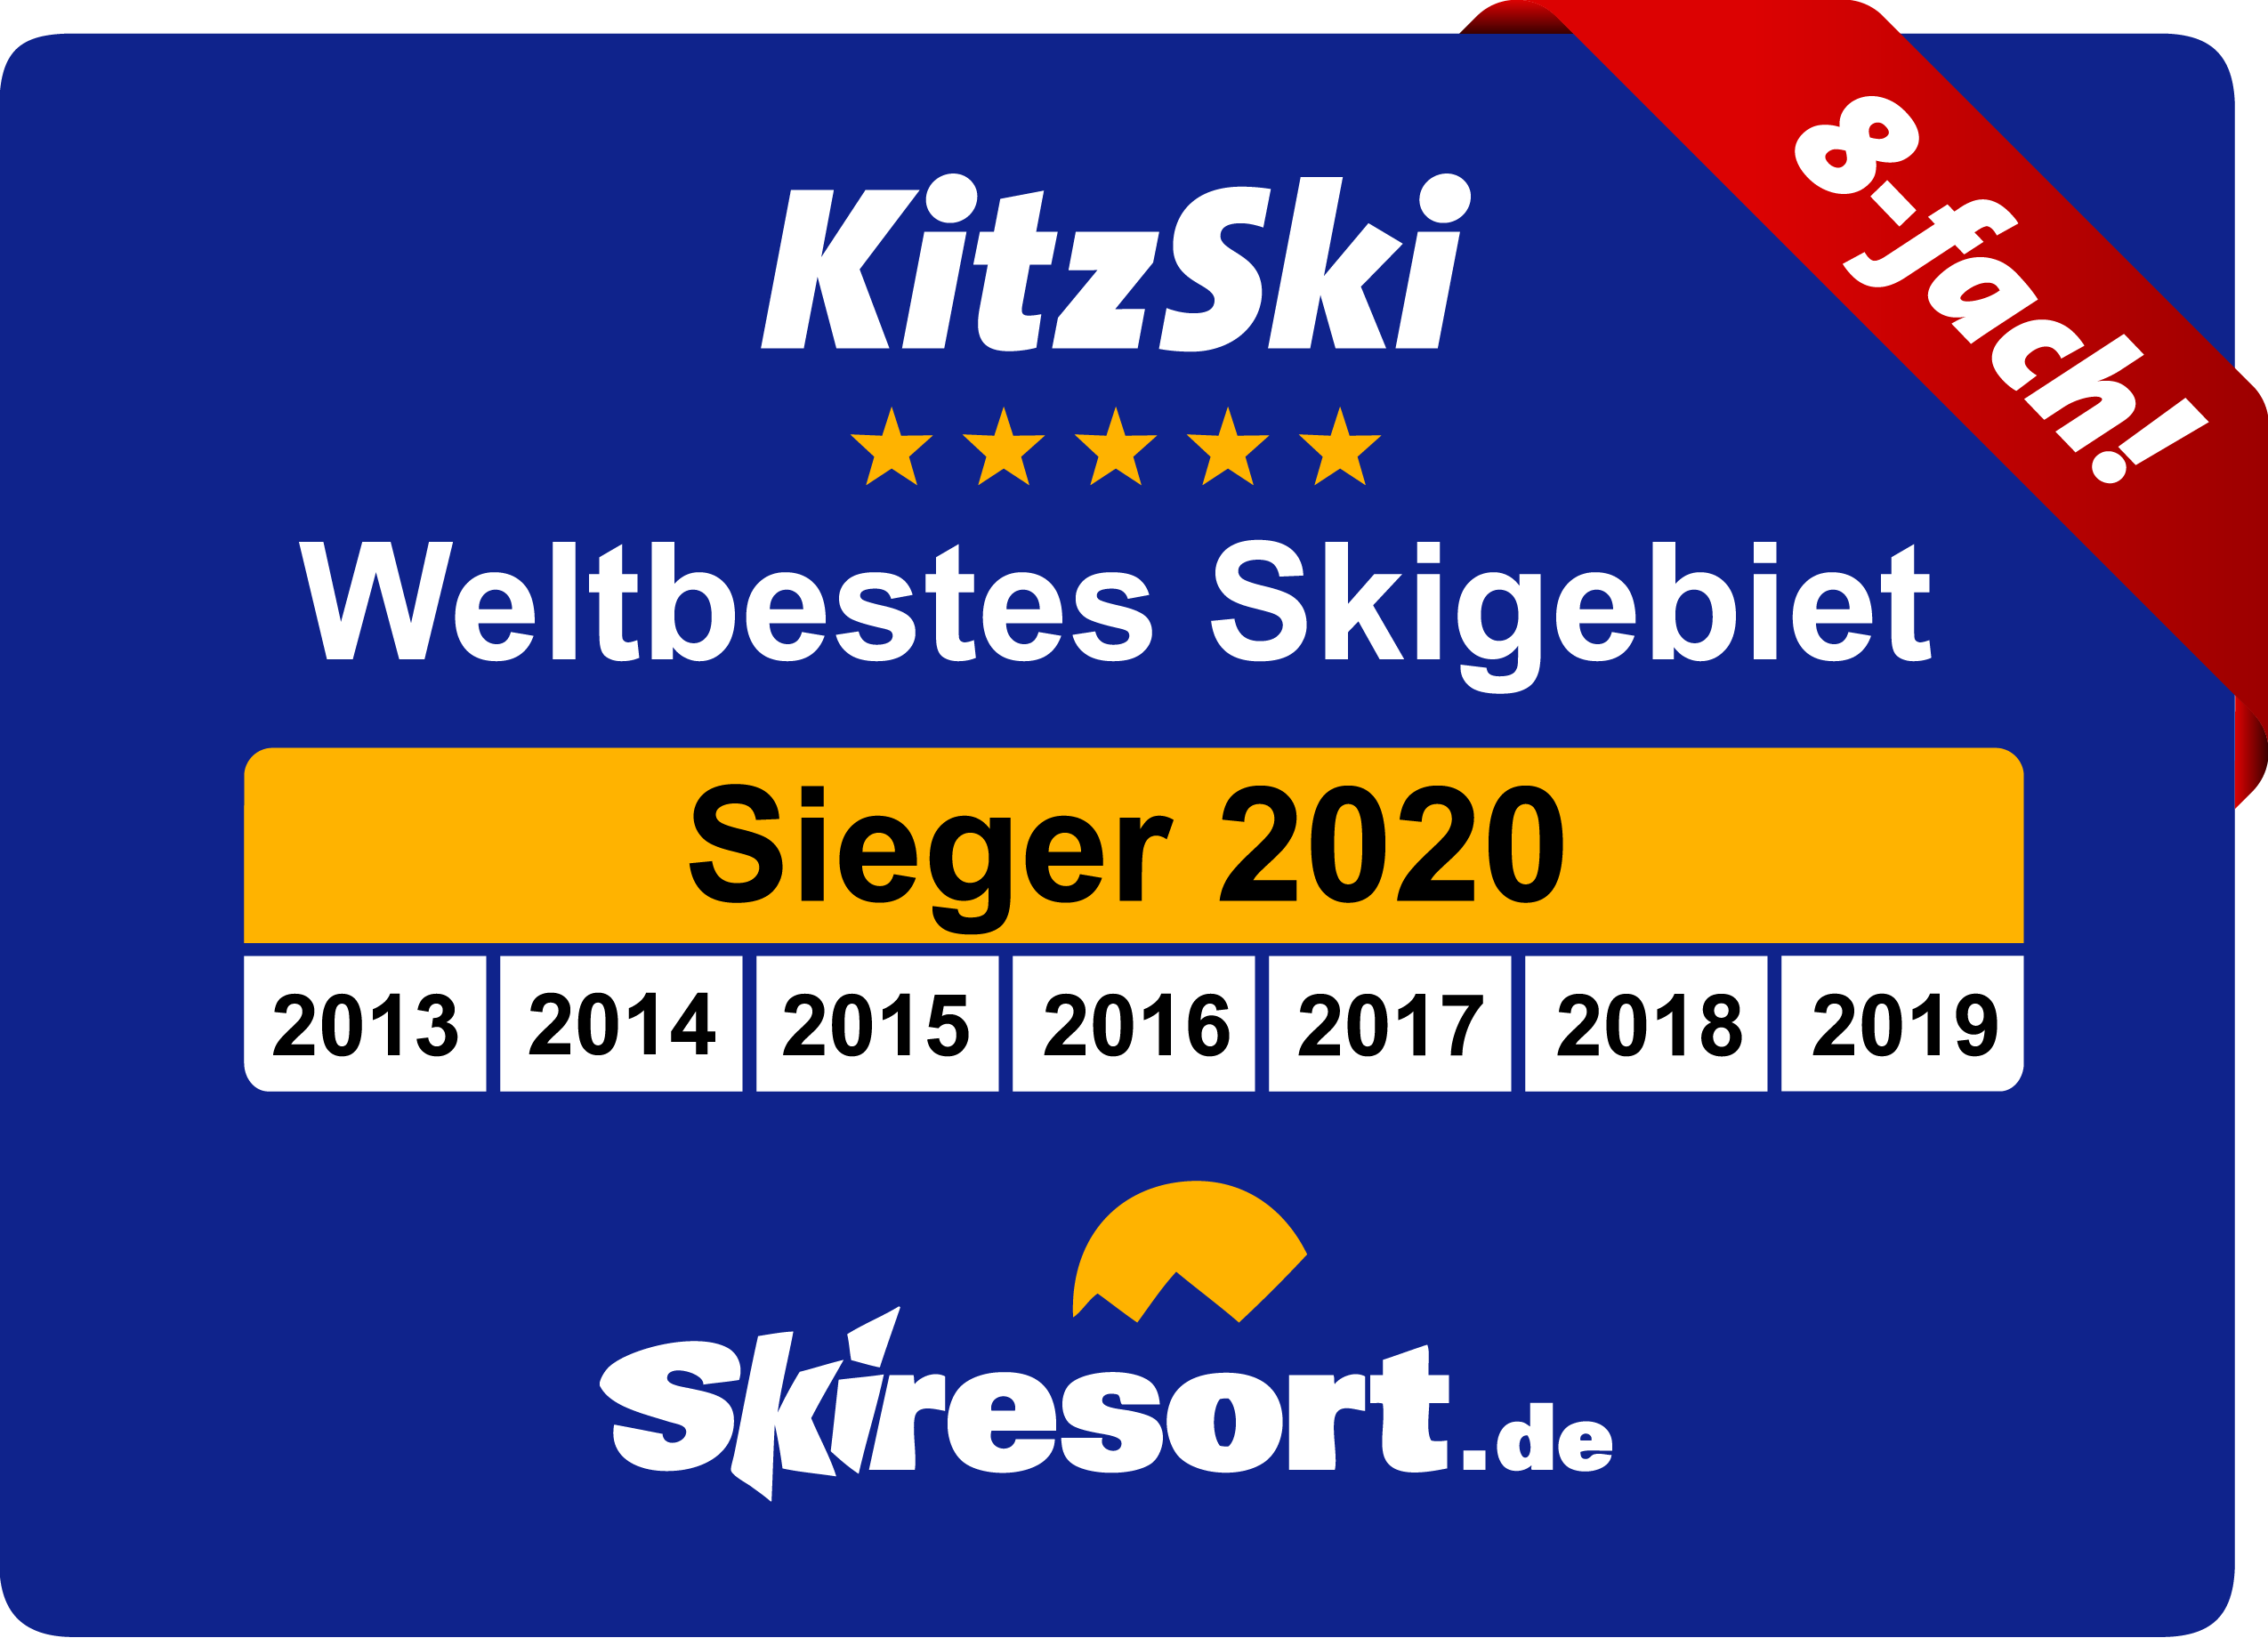 KitzSki Logos - einfach unverkennbar